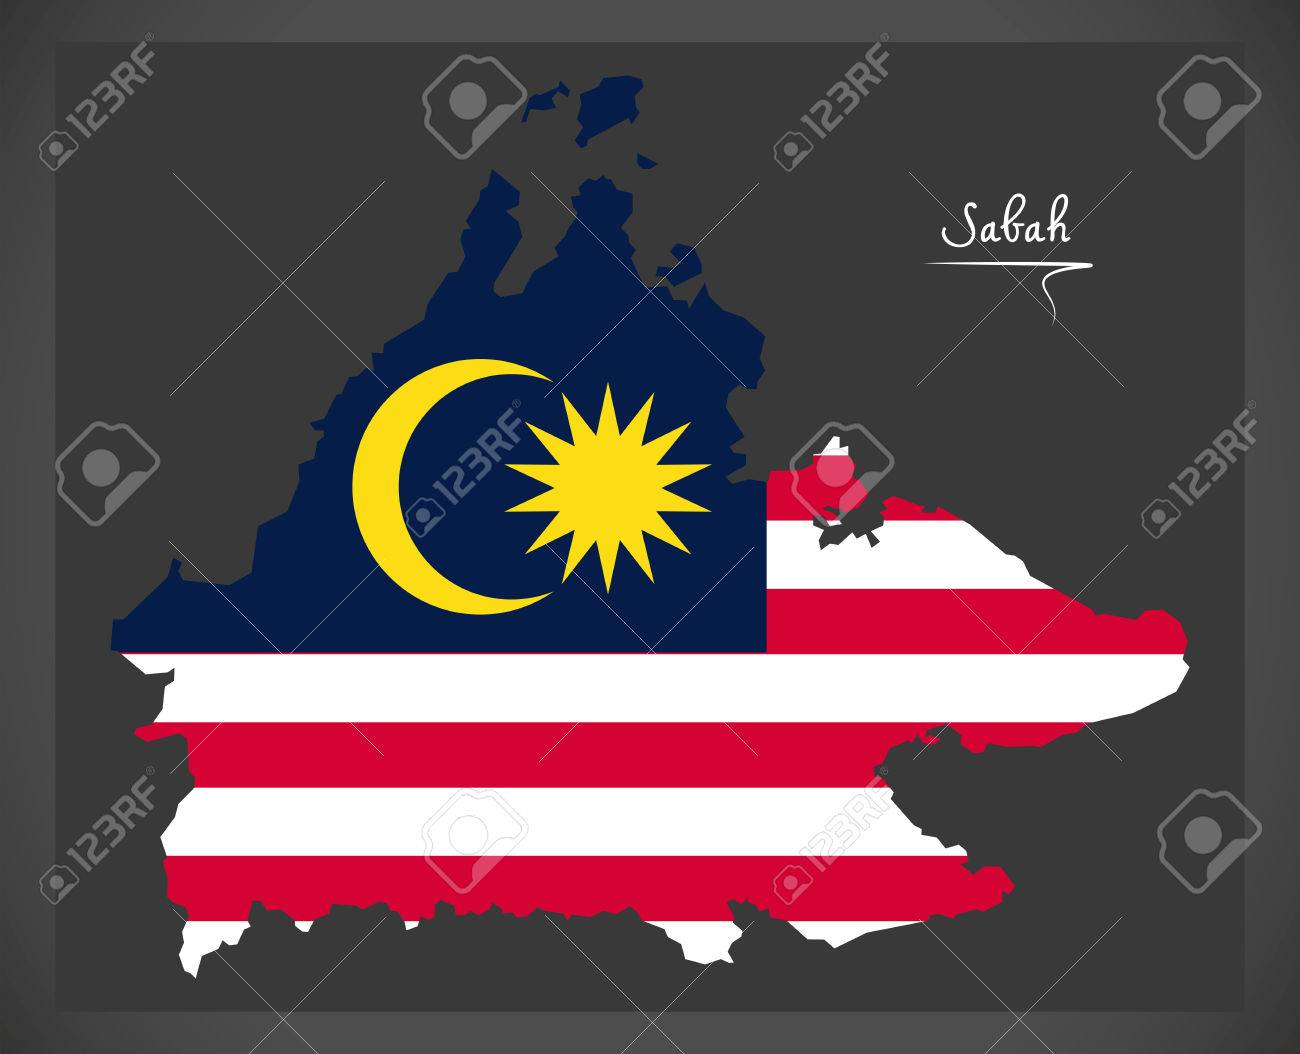 Sabah Malaysia map with Malaysian national flag illustration - 82689396